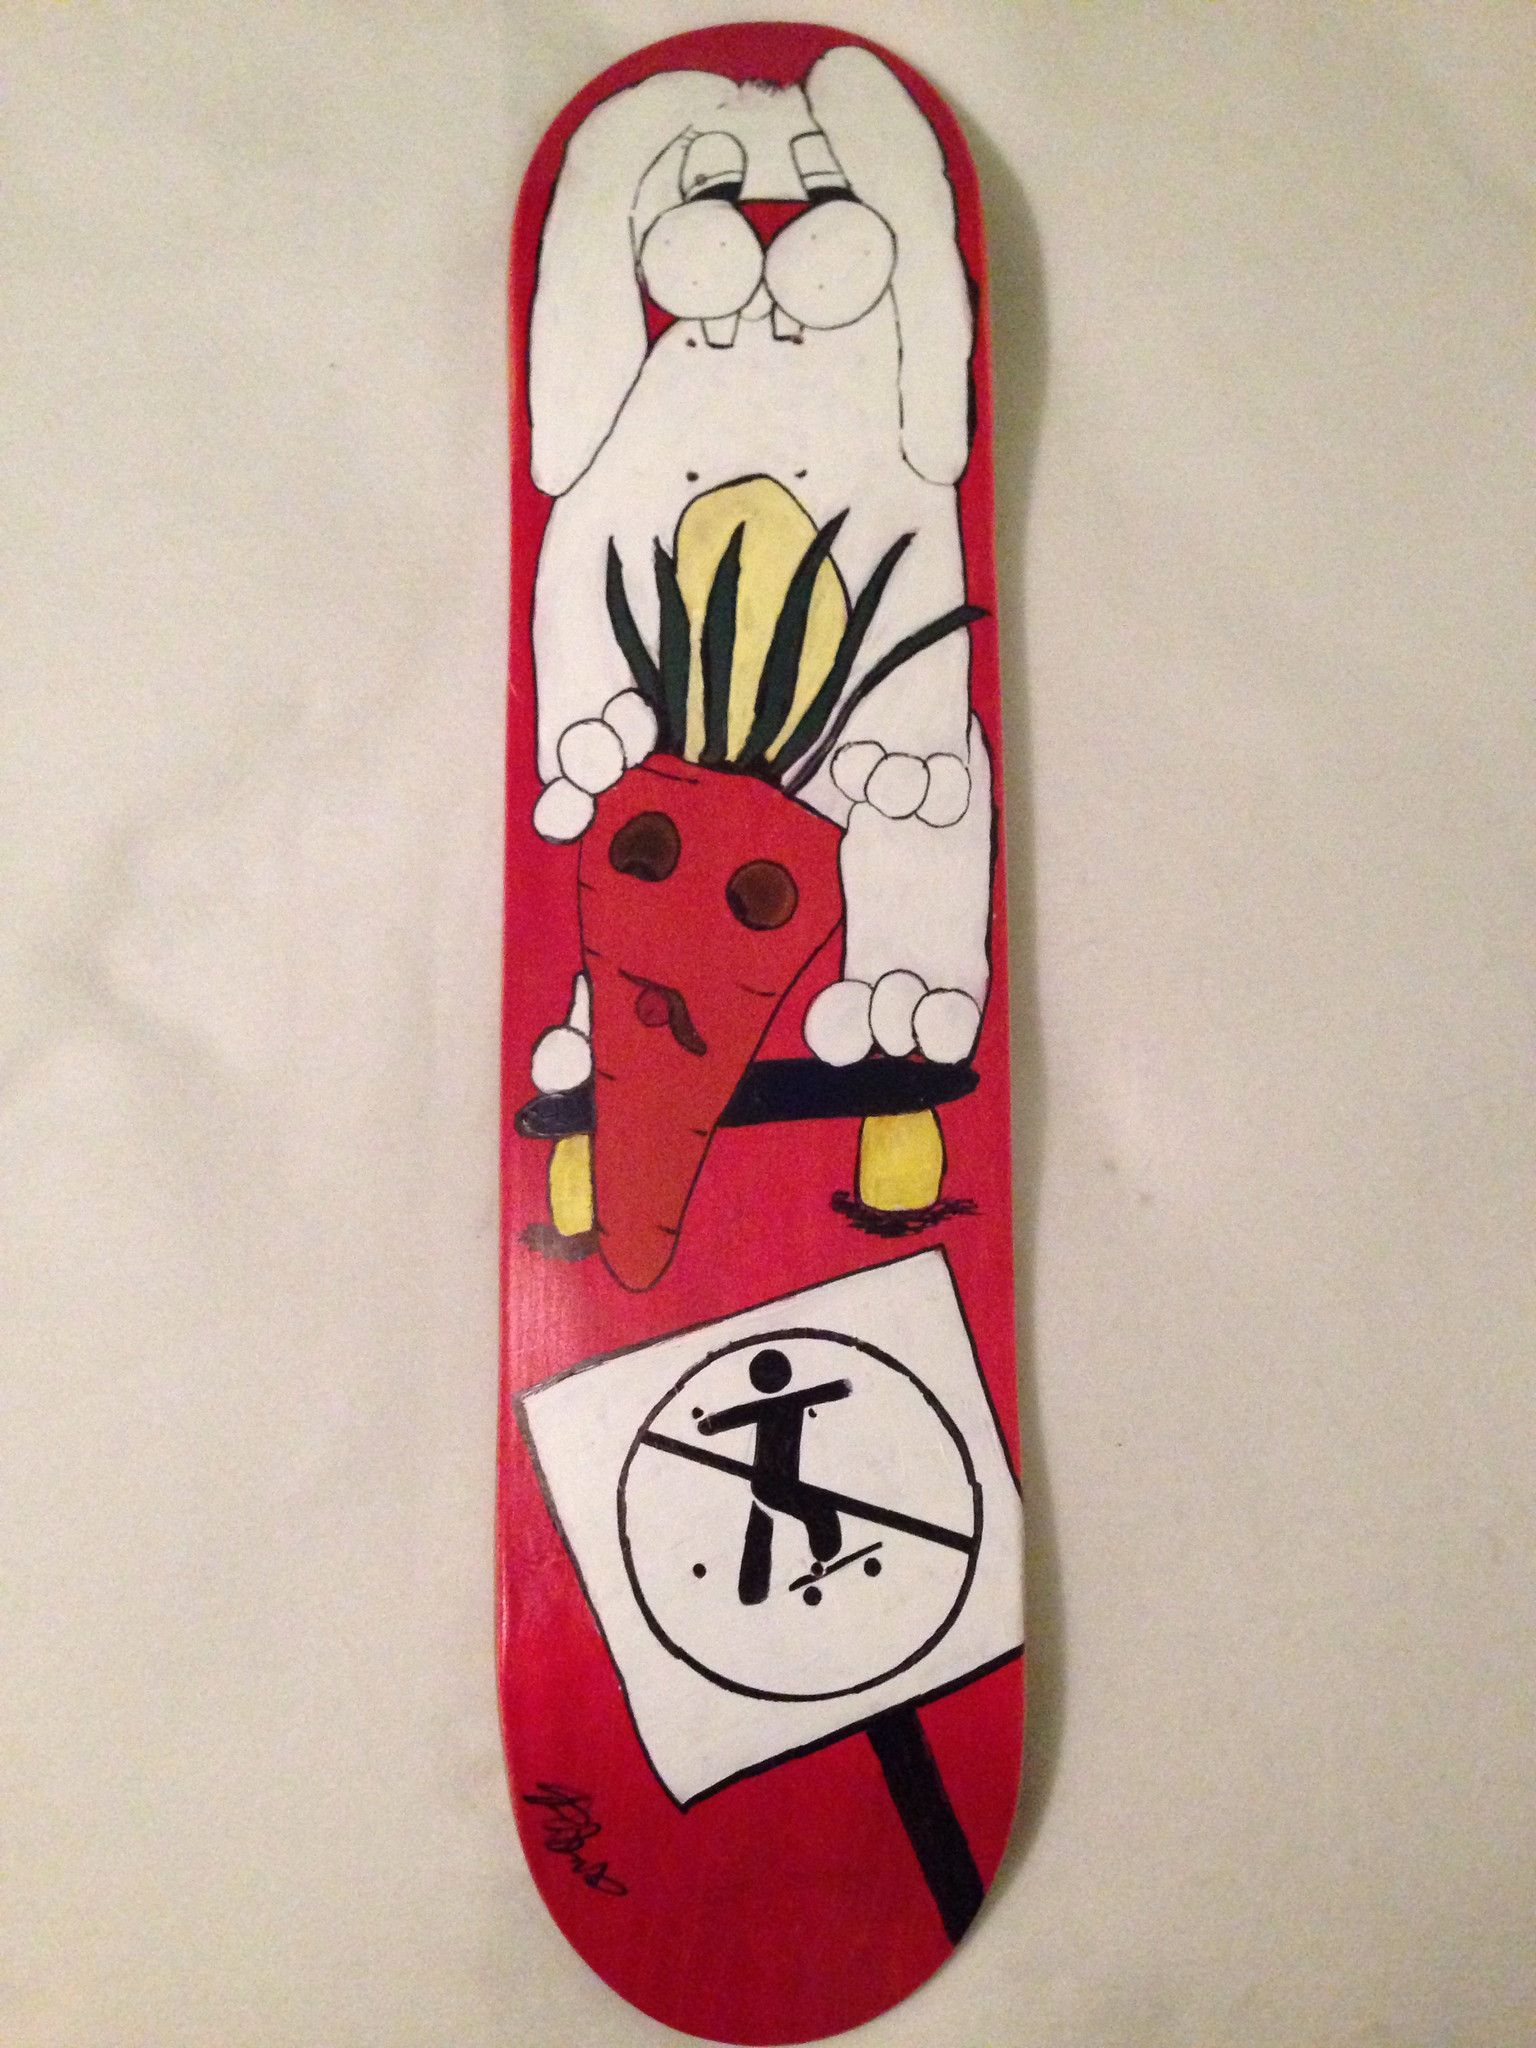 660492cd6c Discount Skateboards Art Palacios Rabbit Fever Deck 8